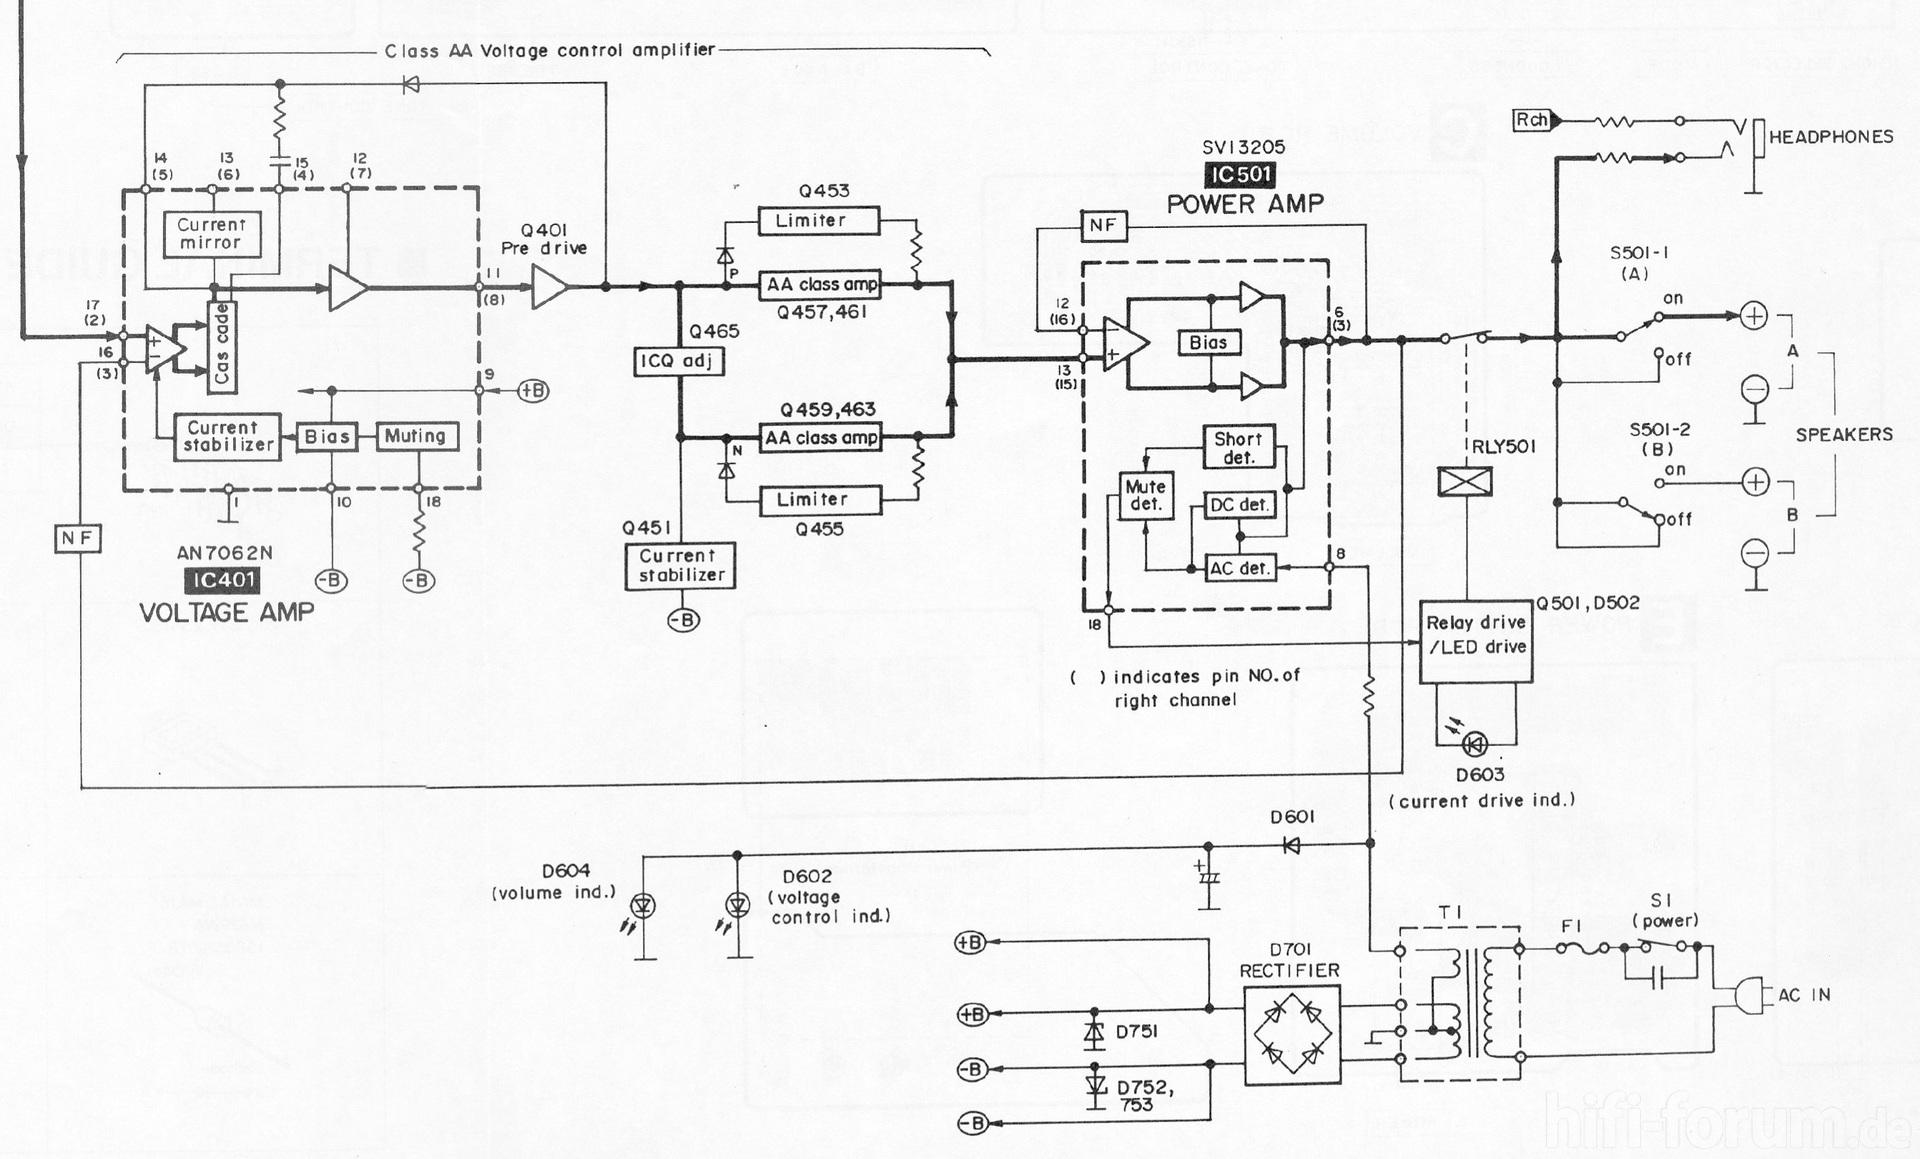 Amp Technics SU-V660 Keine Relaisfreigabe, Hifi-Klassiker - HIFI-FORUM